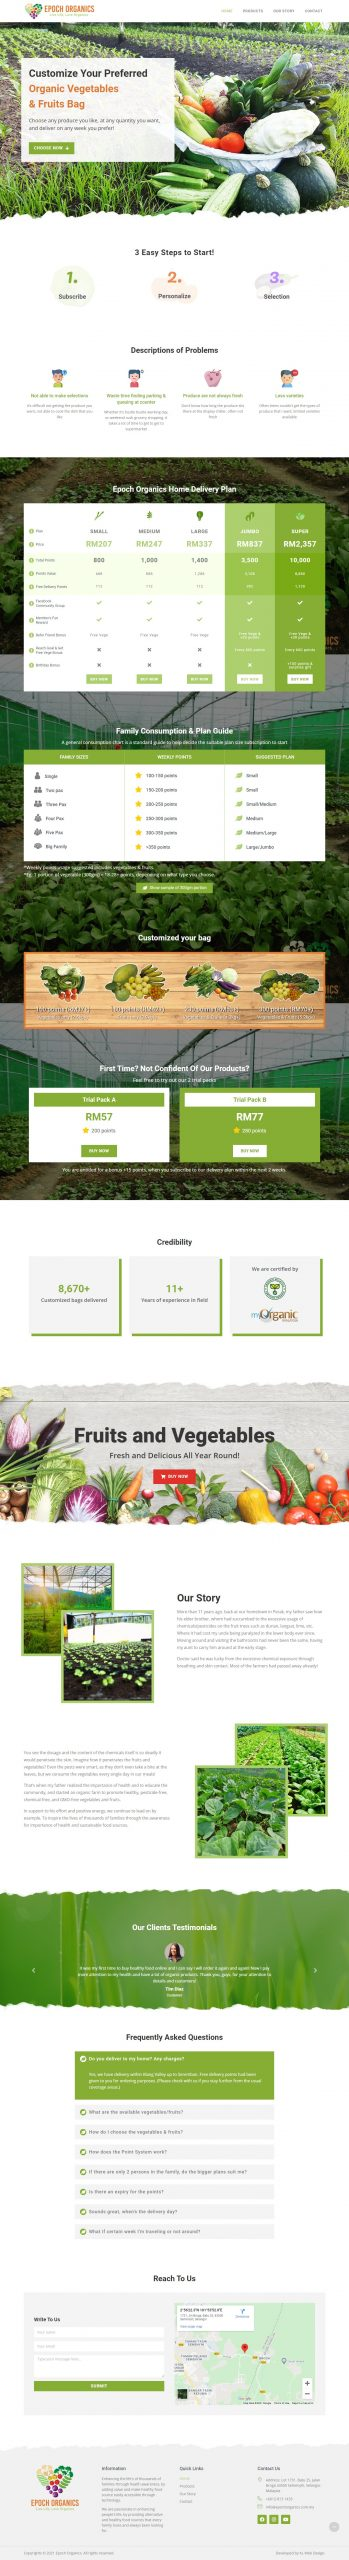 Epoch Organics